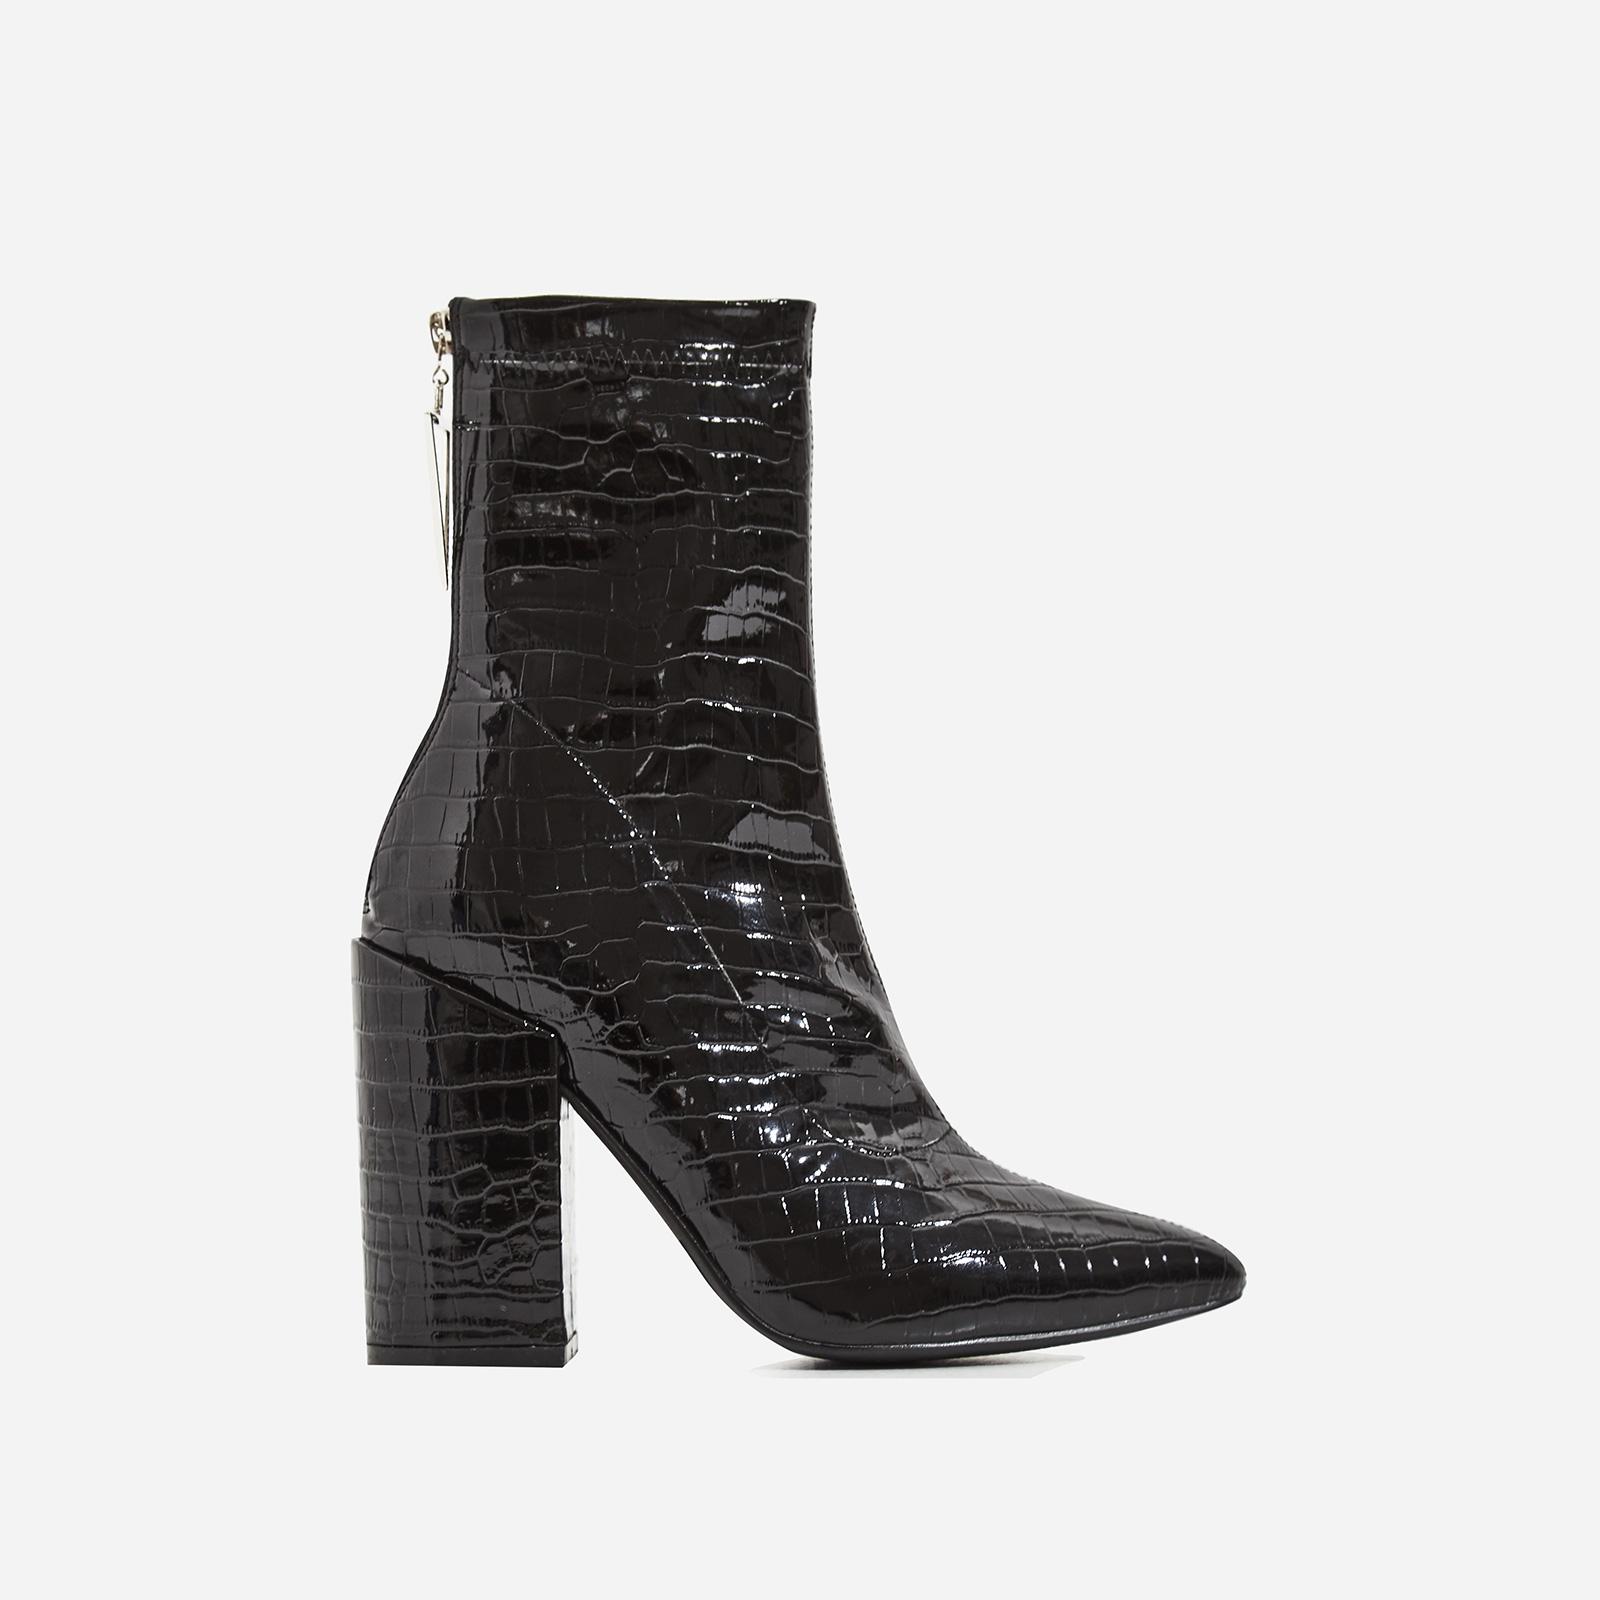 Monica Triangle Zip Detail Black Heel Ankle Boot In Black Croc Print Patent